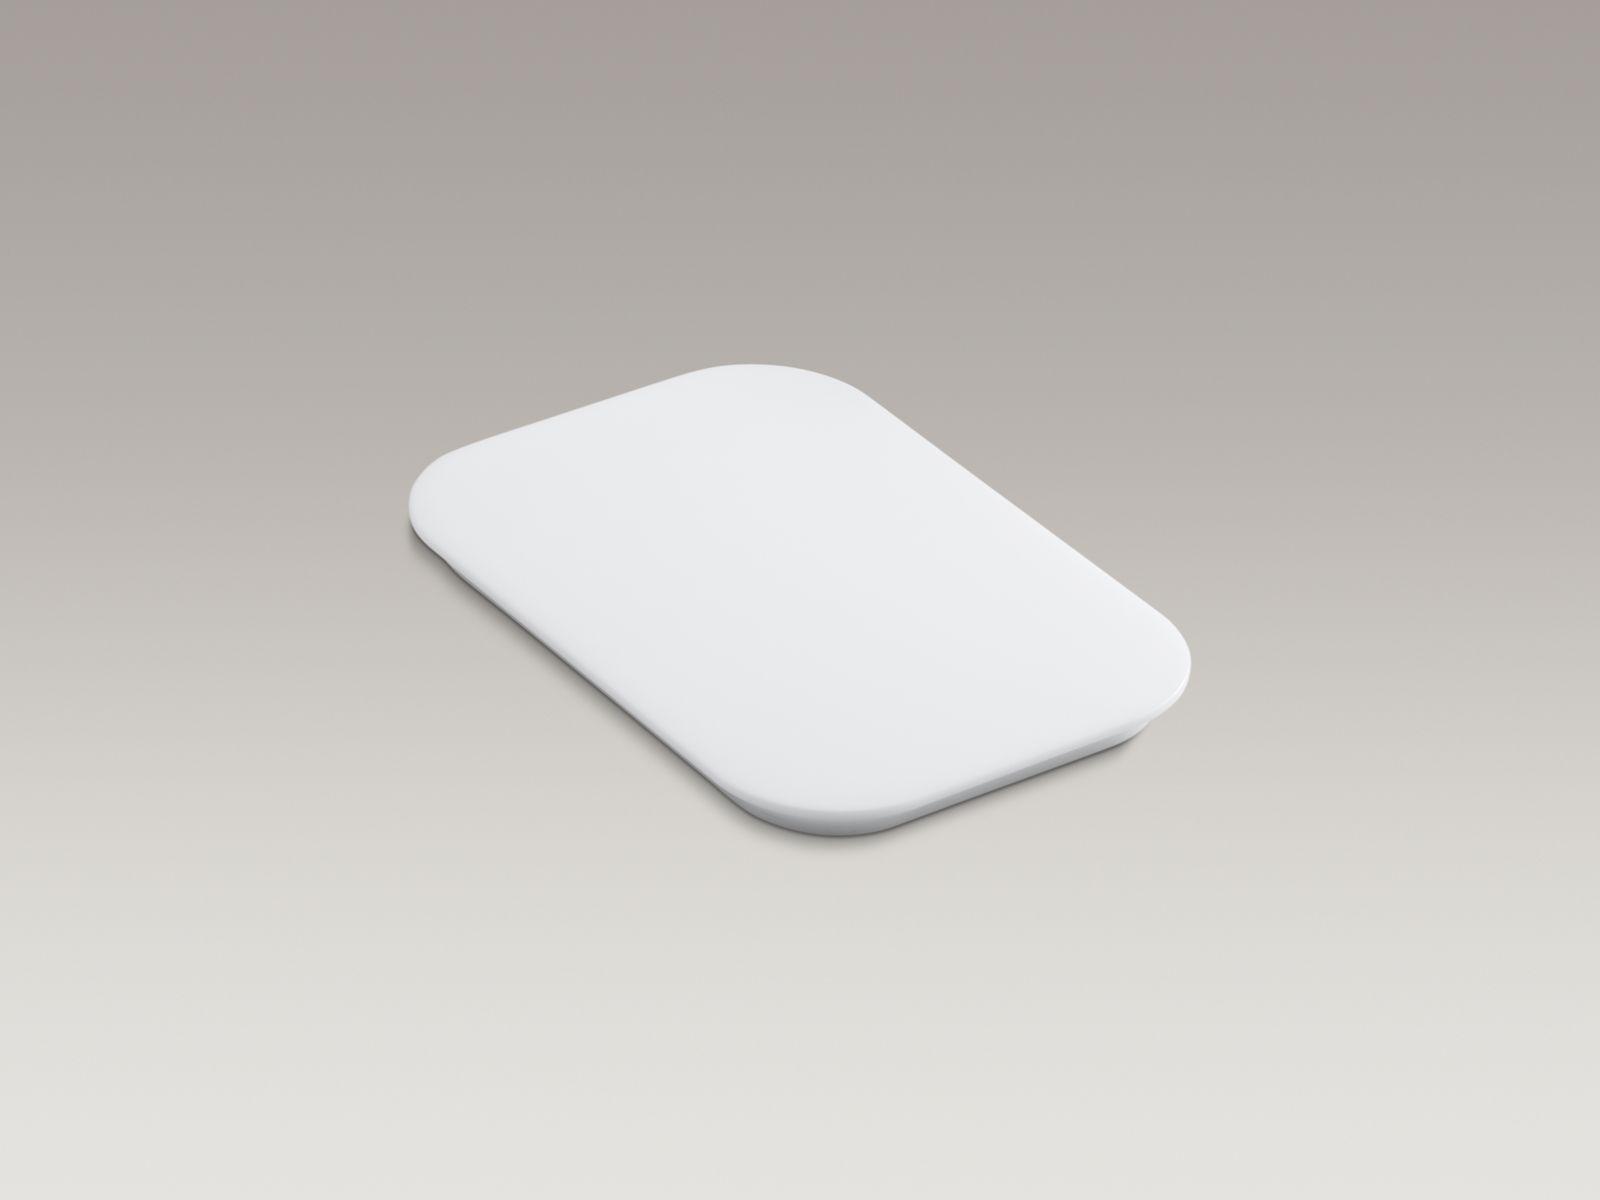 Kohler K-5836-0 Bakersfield Polyethylene Cutting Board White